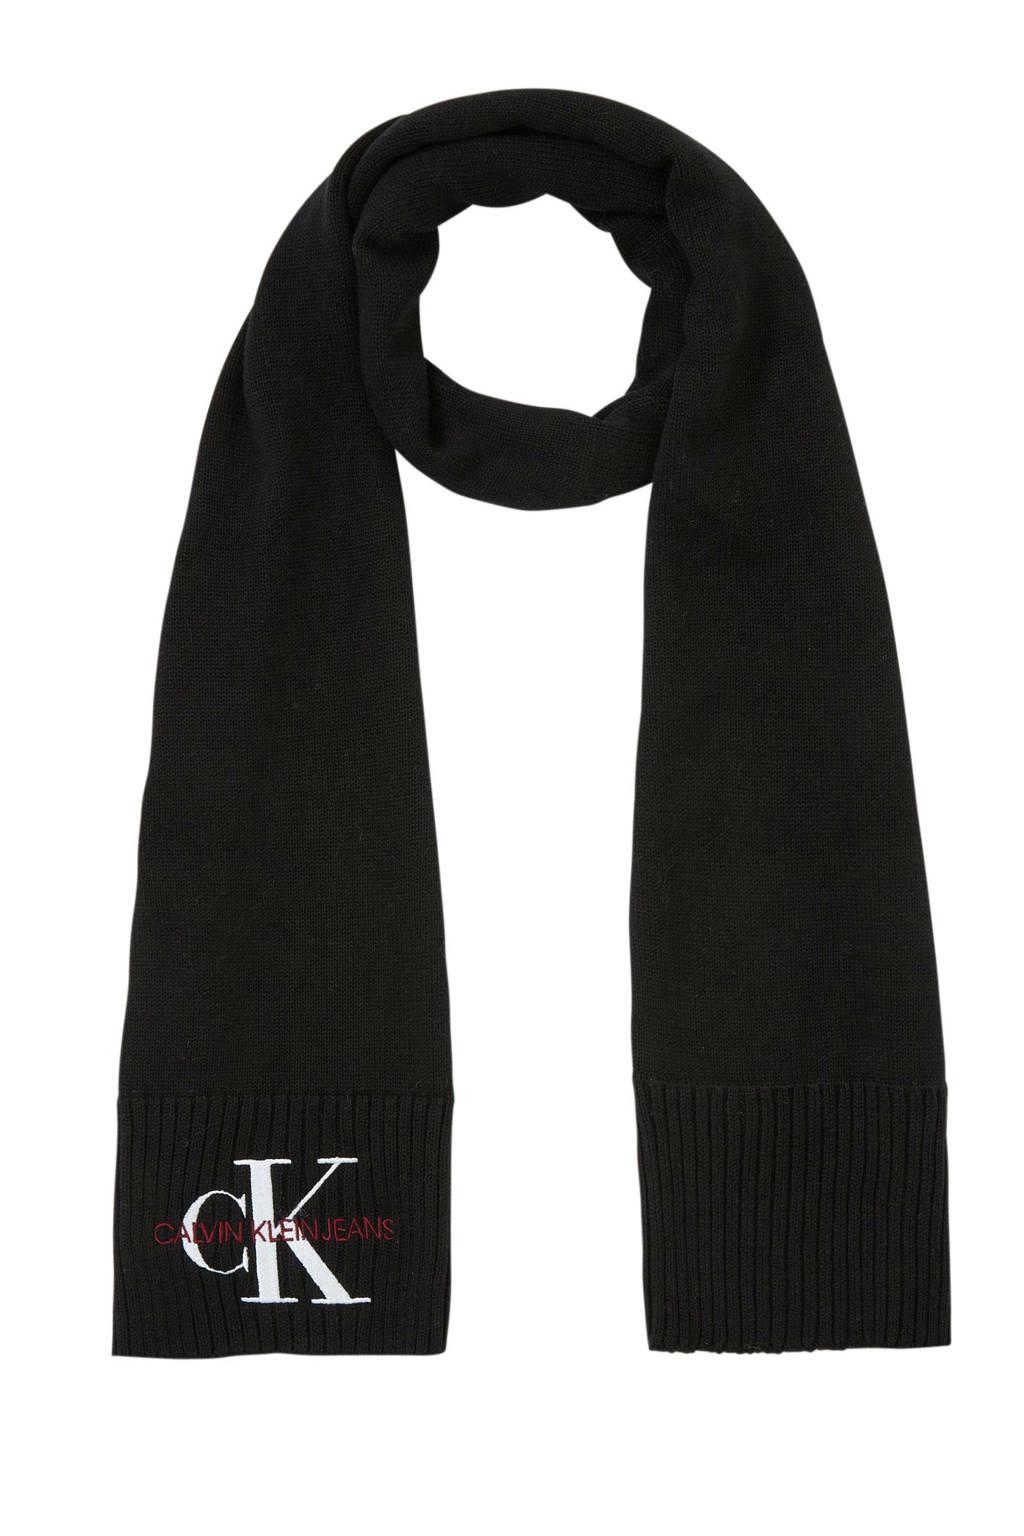 CALVIN KLEIN JEANS sjaal J Basic zwart, Zwart